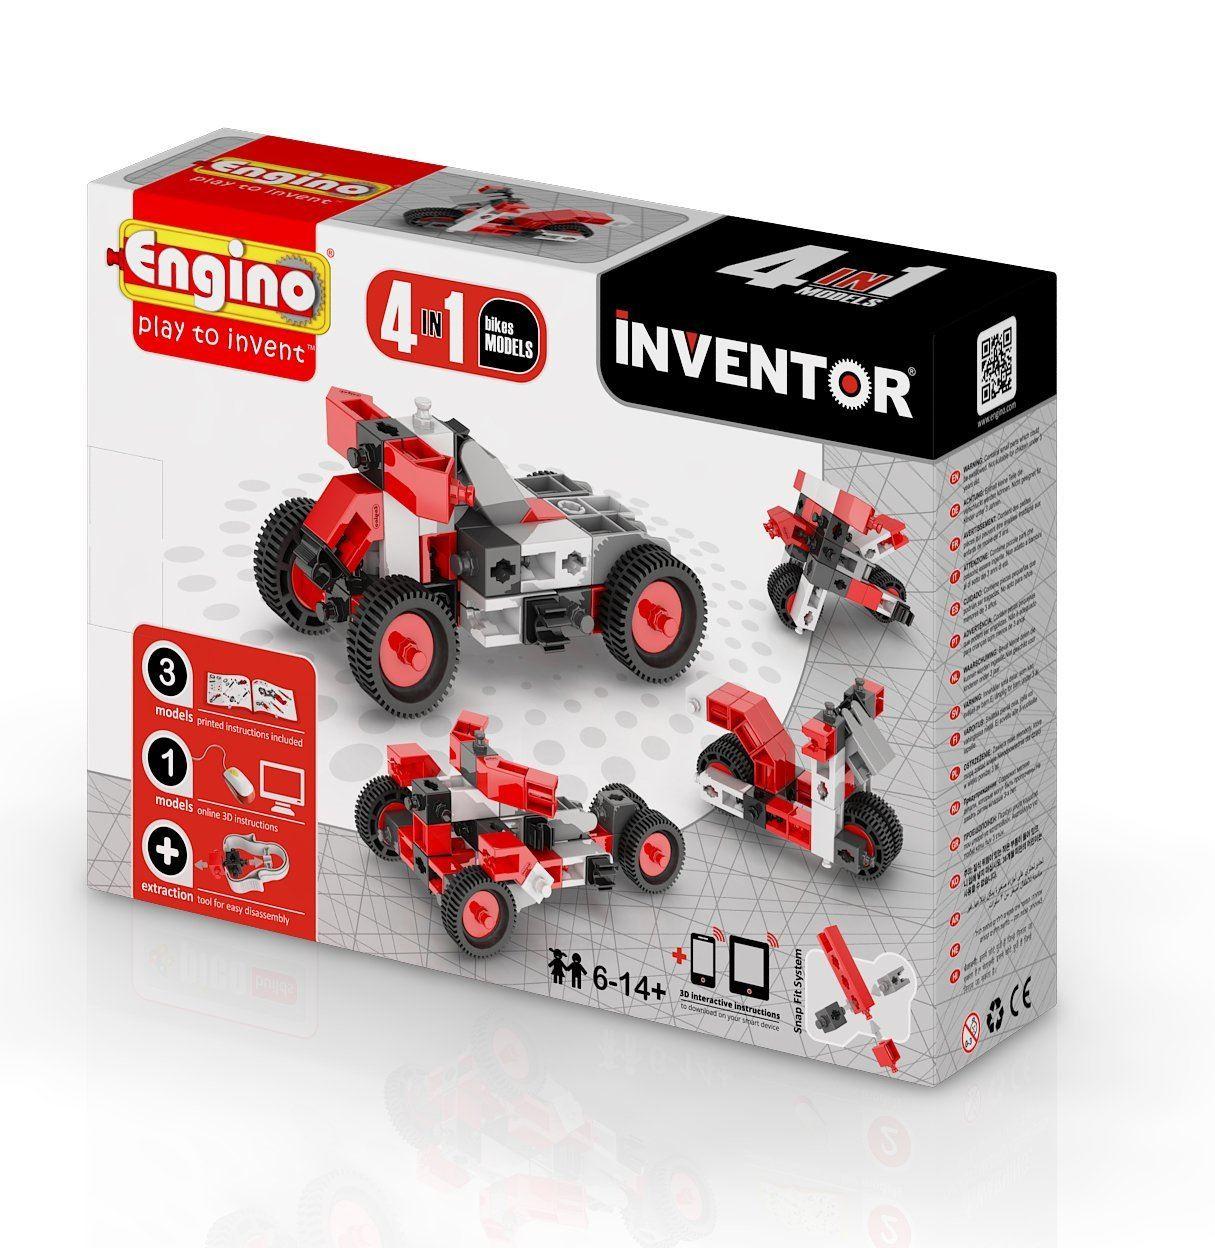 Engino Inventor 4 Models Motorbikes #0432